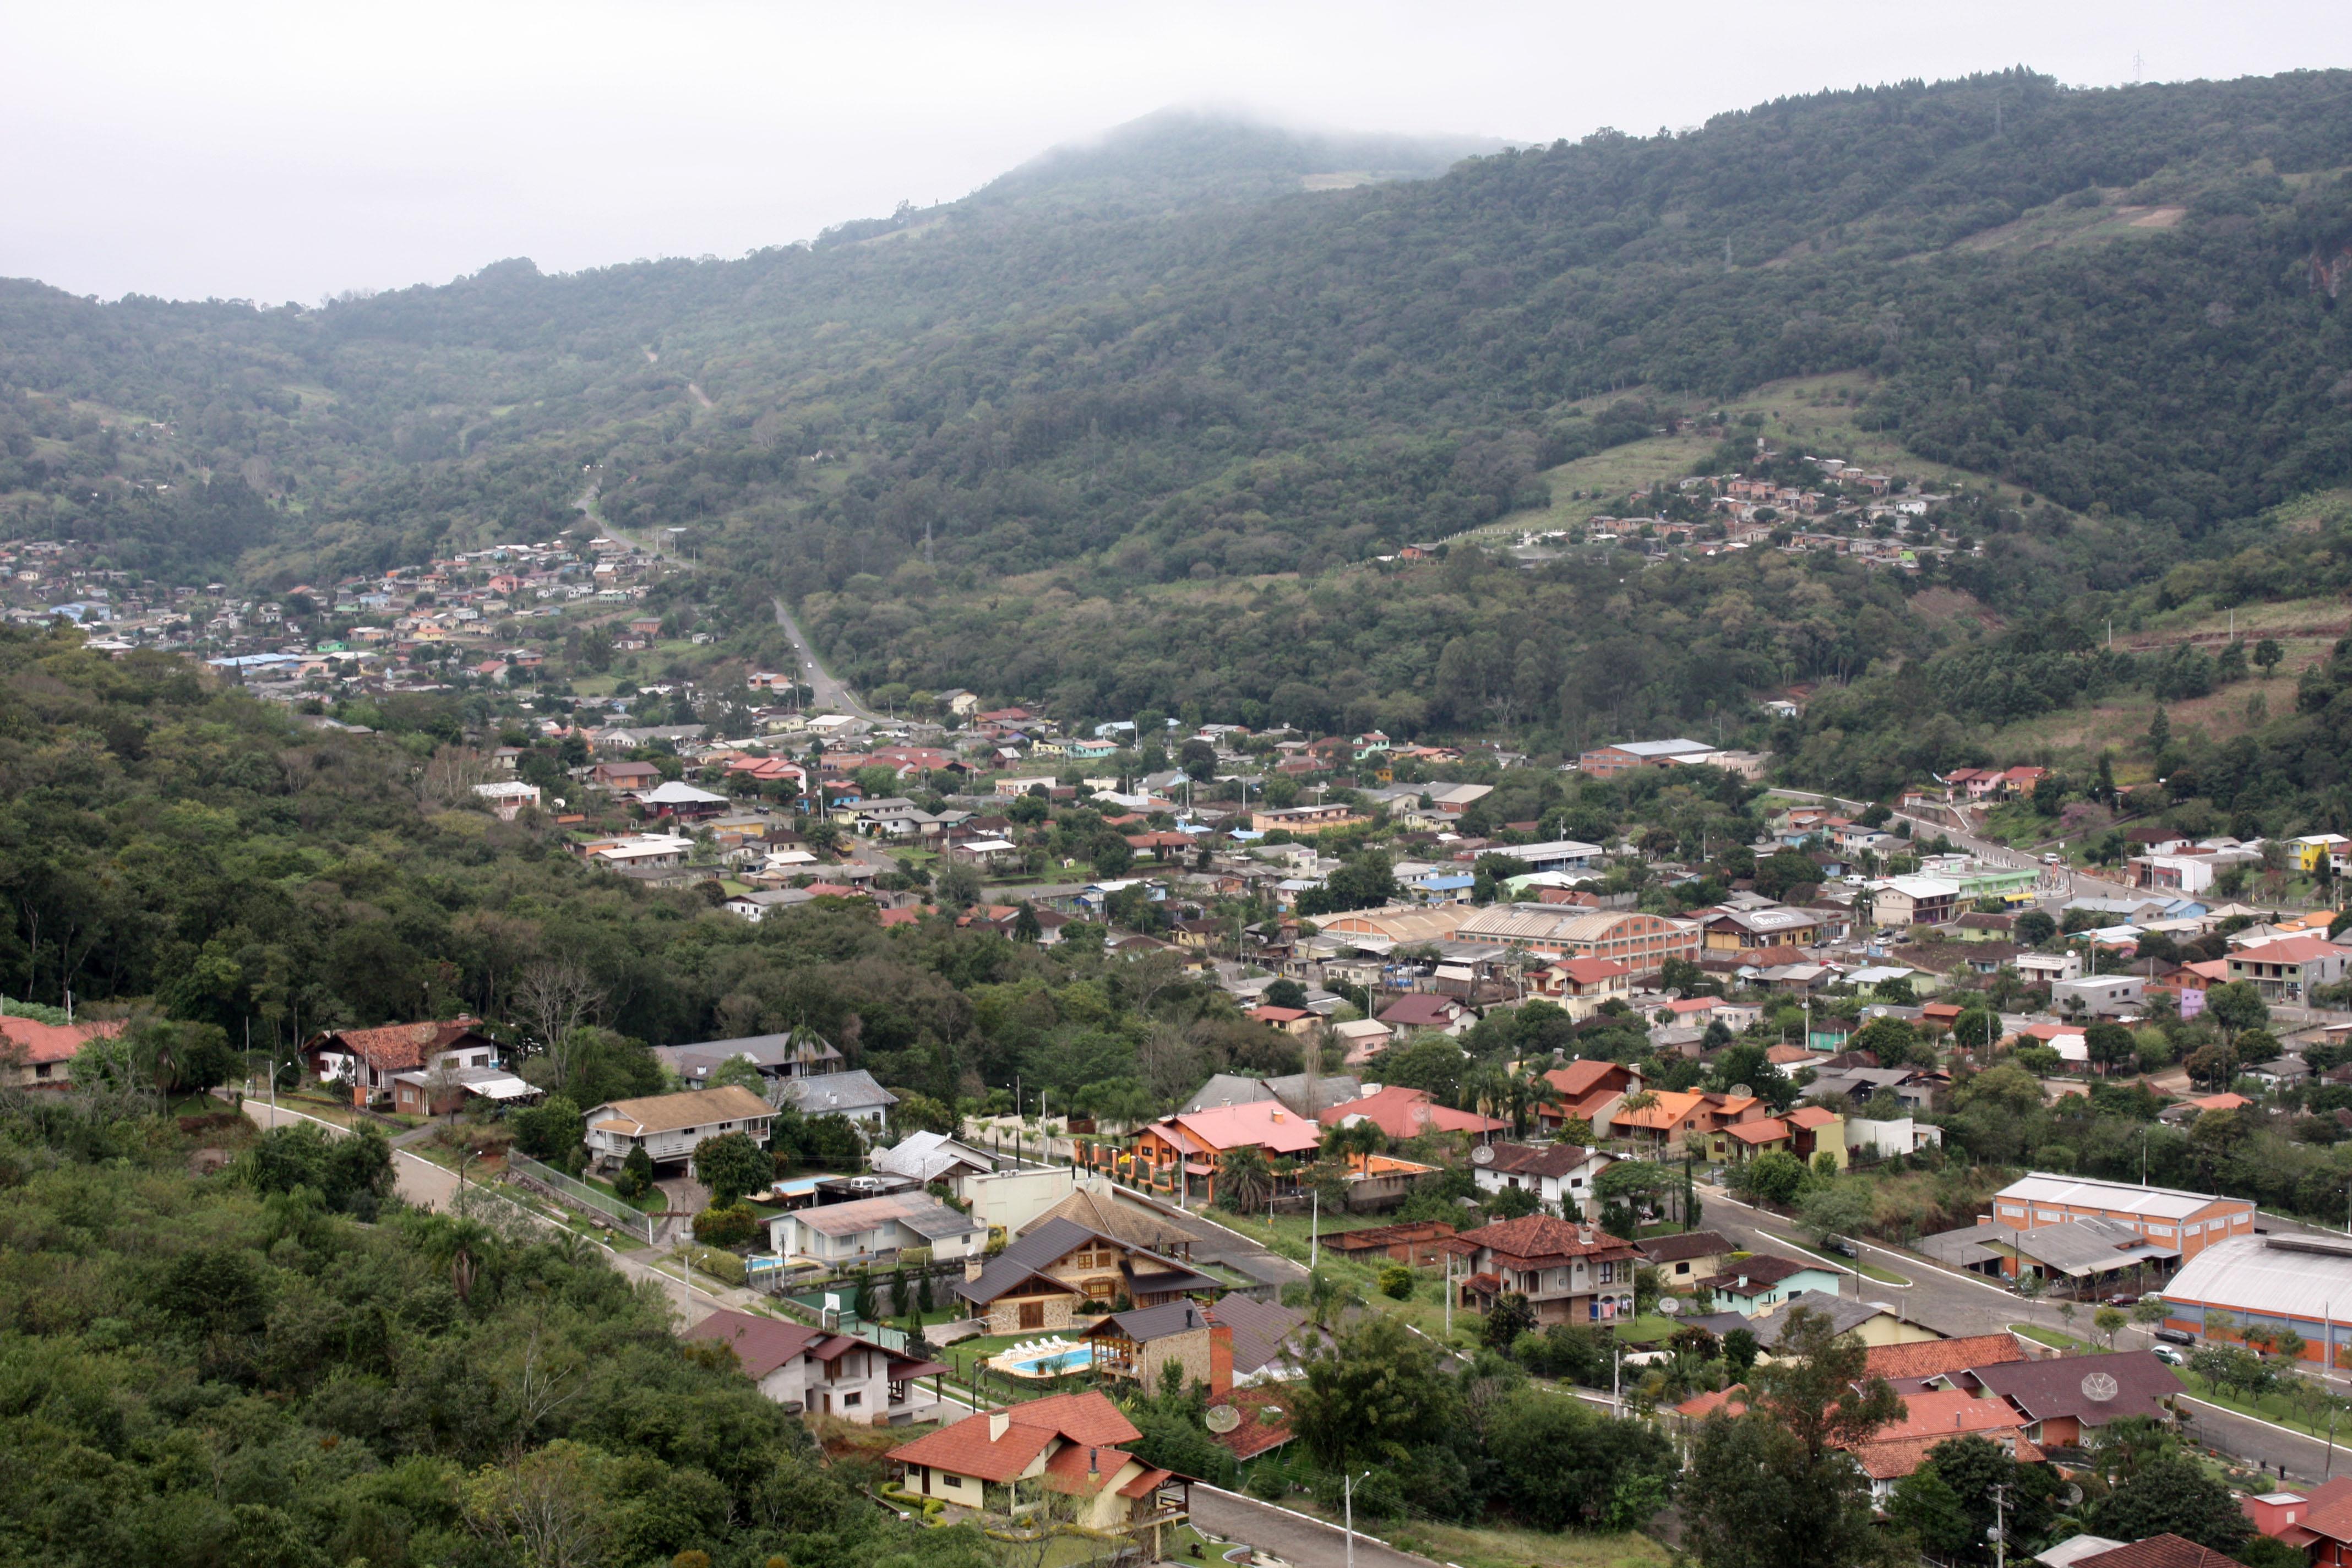 Igrejinha Rio Grande do Sul fonte: upload.wikimedia.org